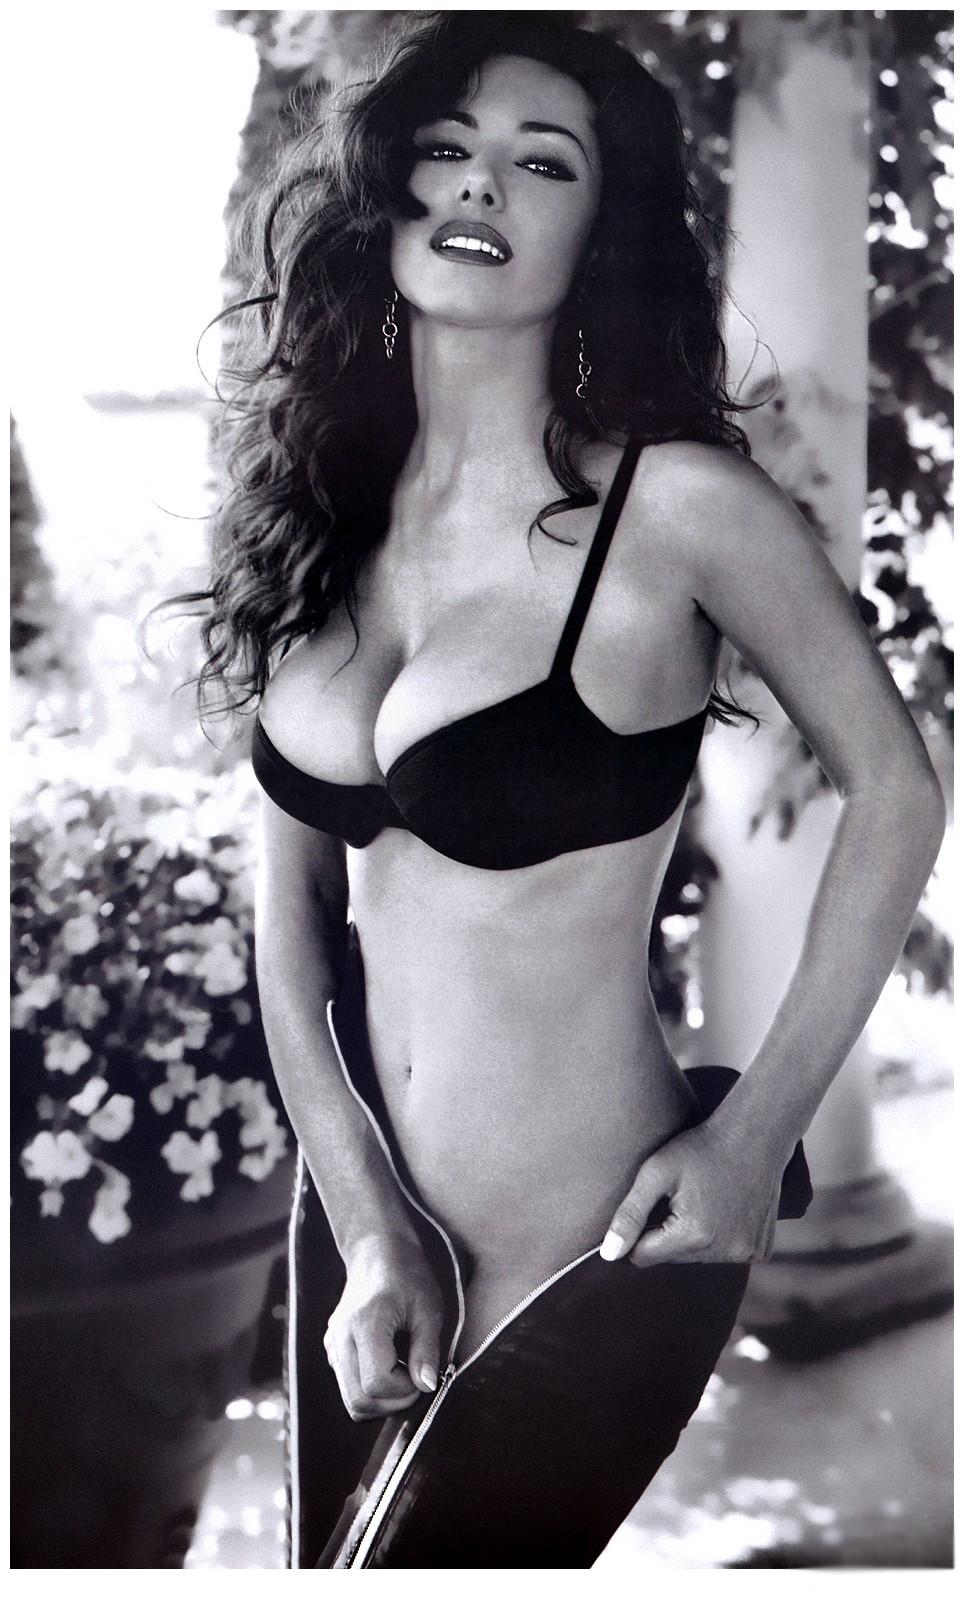 italian naked women video